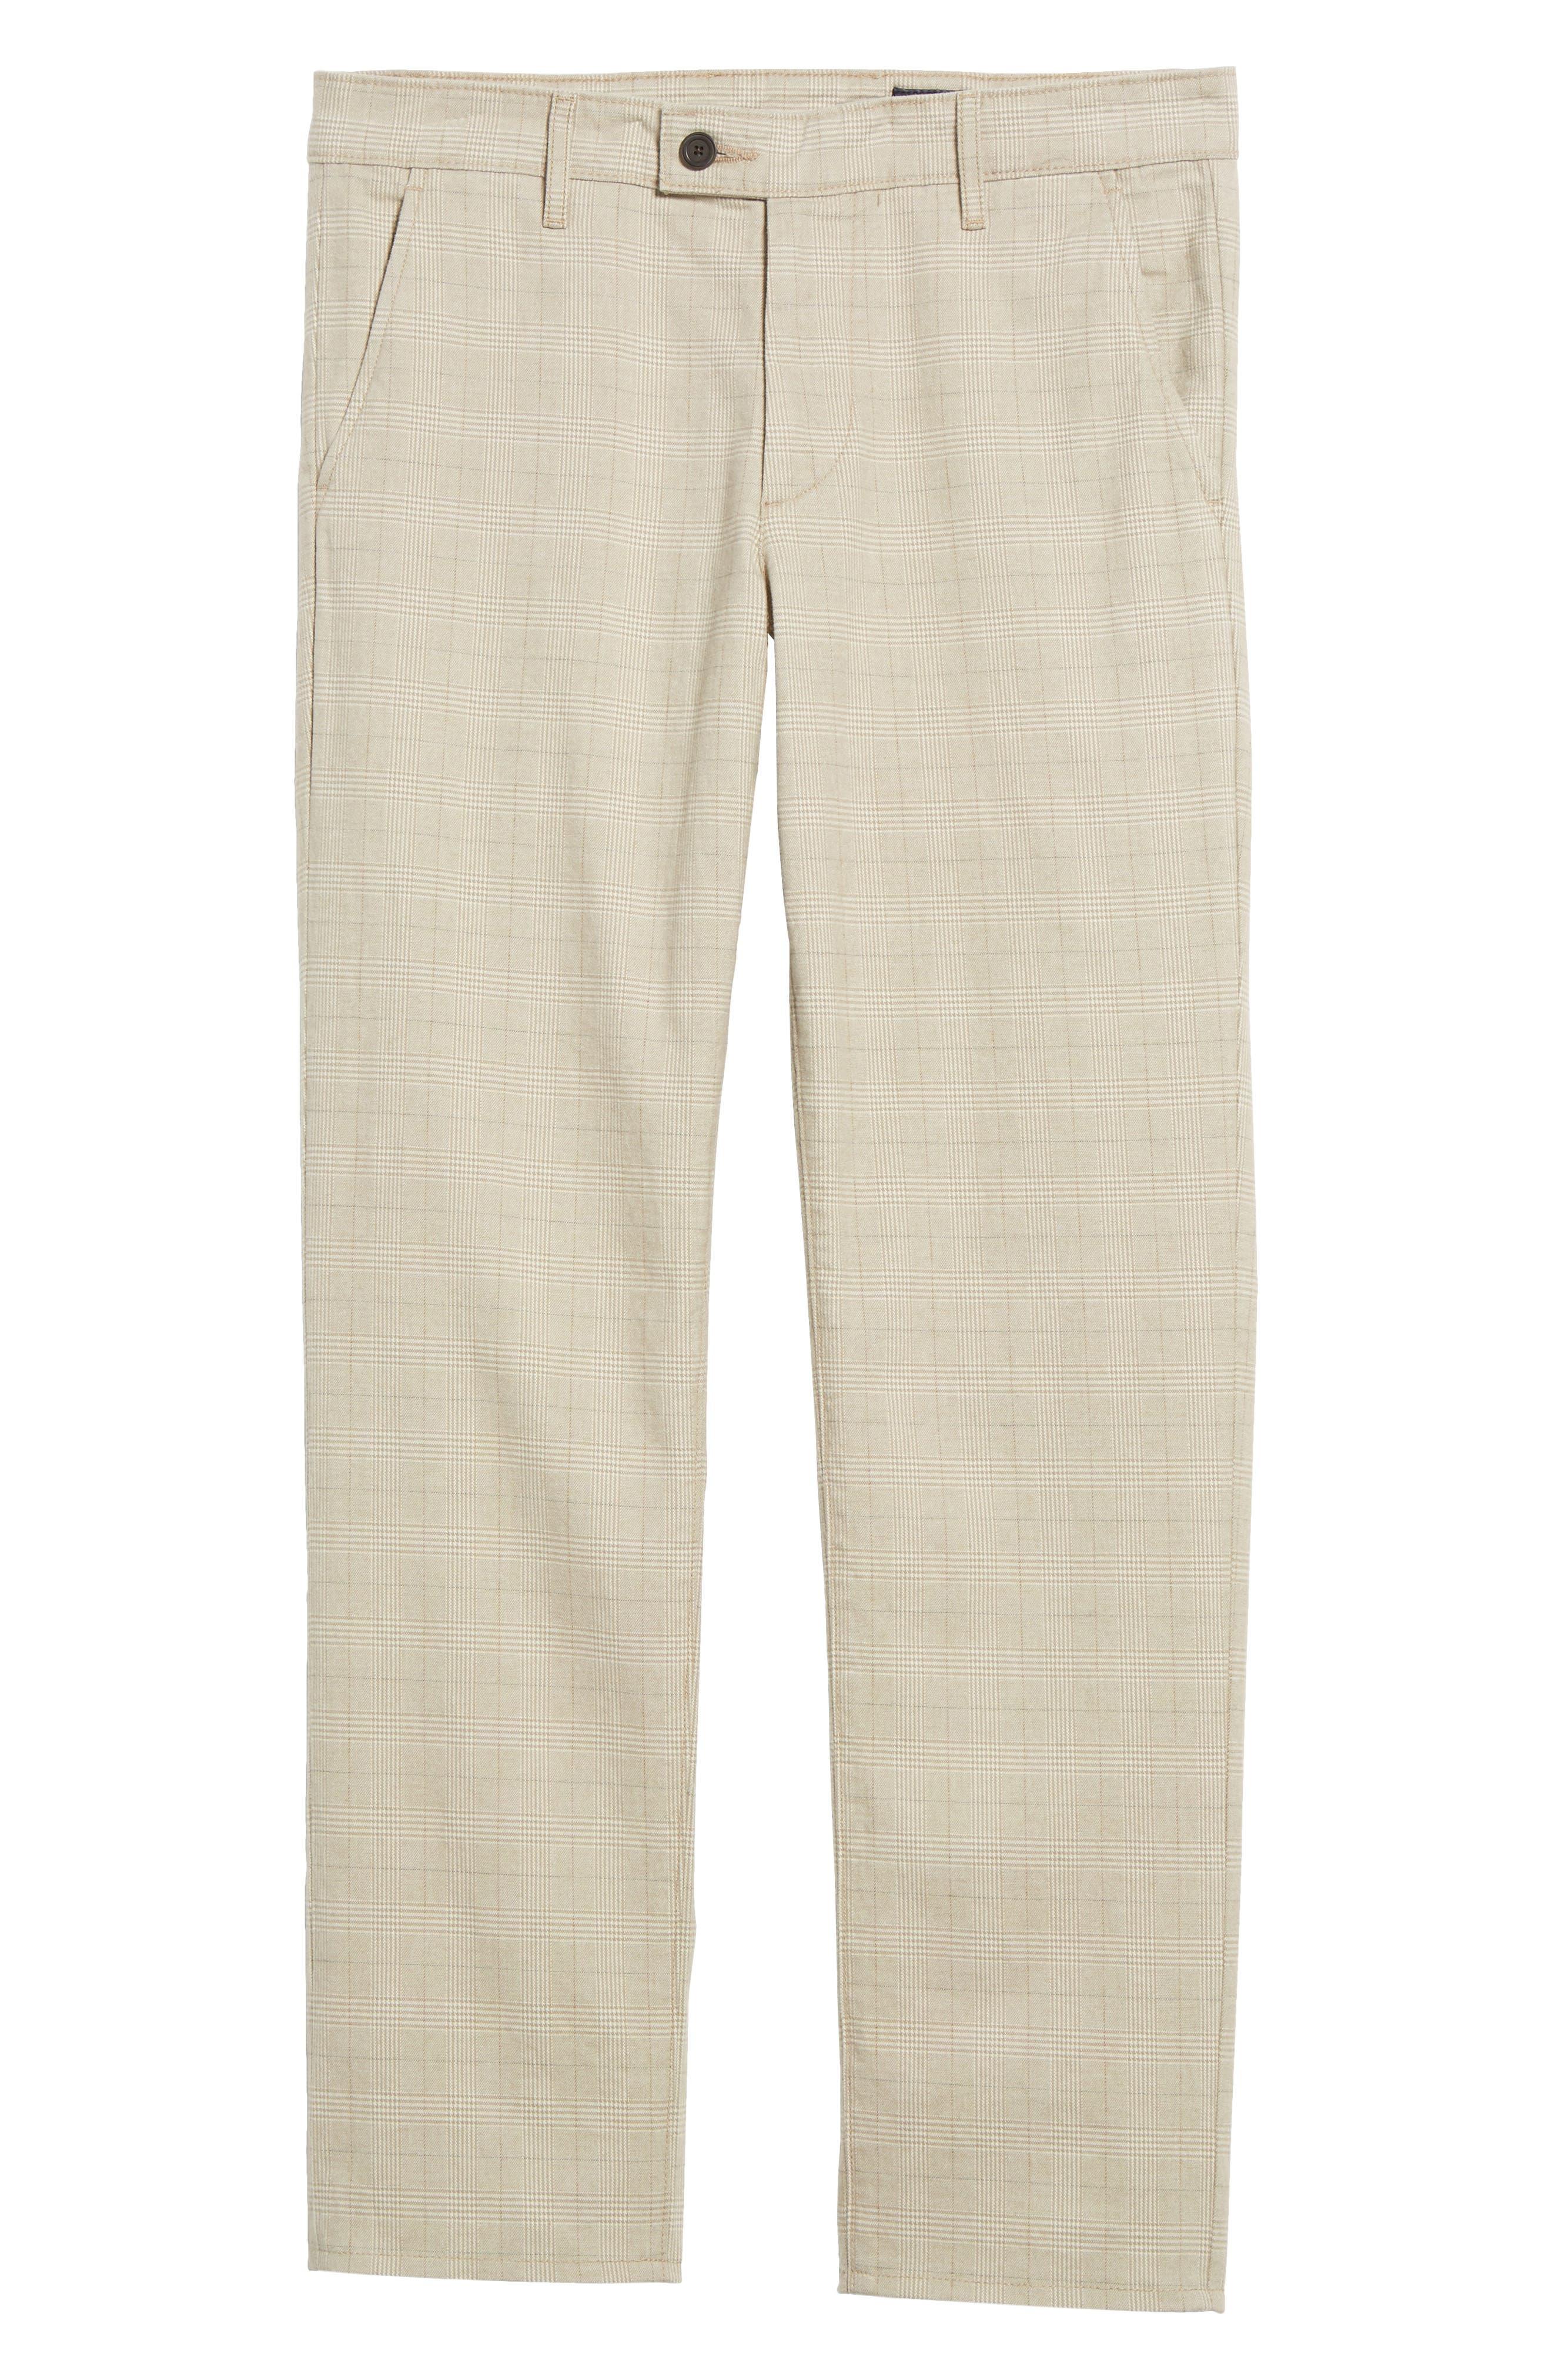 Marshall Slim Fit Pants,                             Alternate thumbnail 17, color,